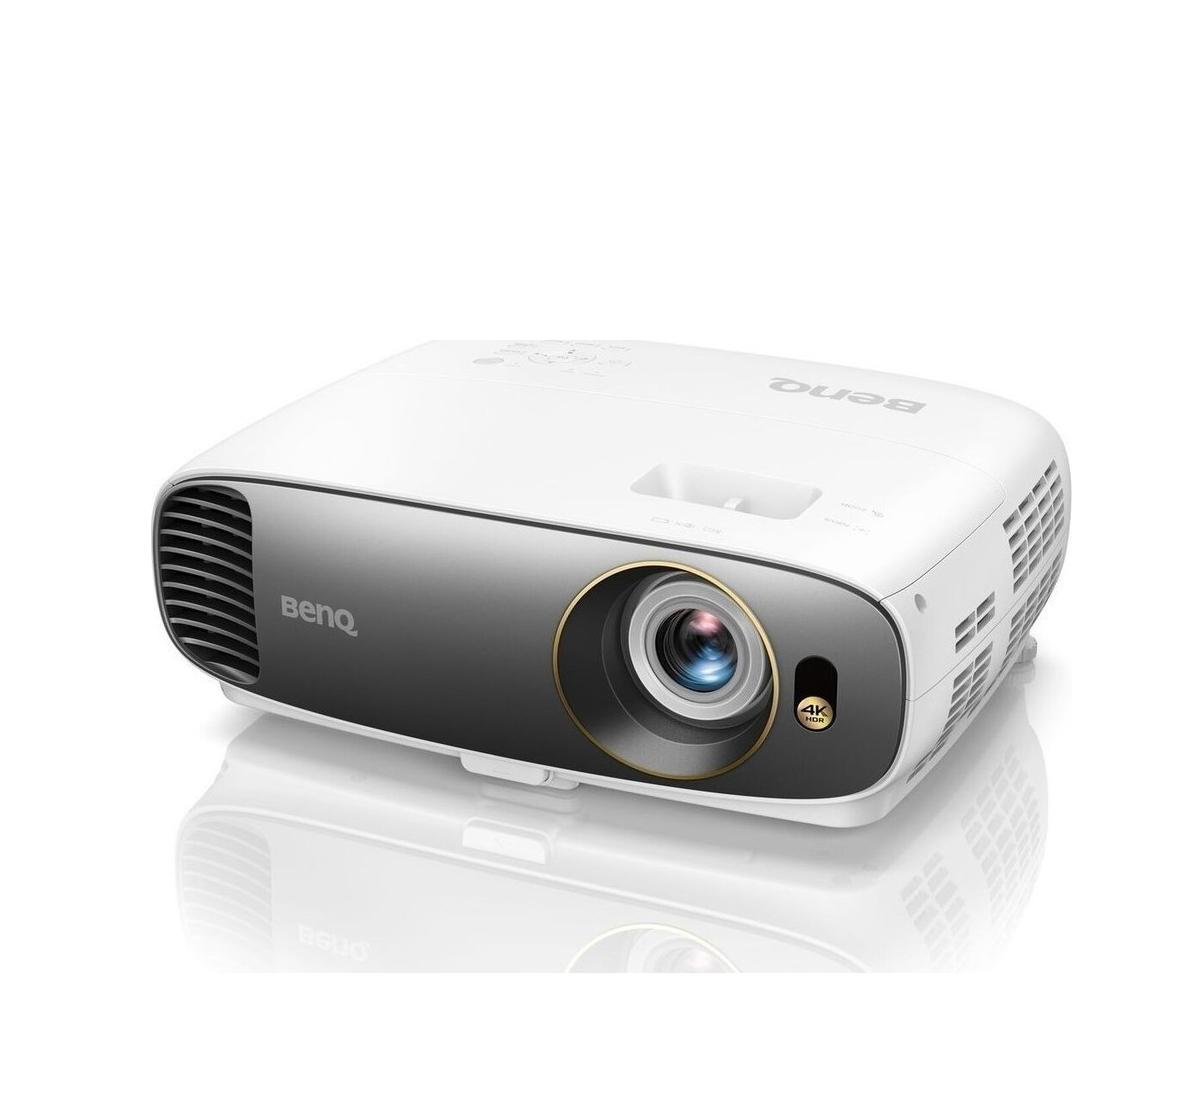 BenQ W1700 Projector Πληρωμή έως 24 δόσεις